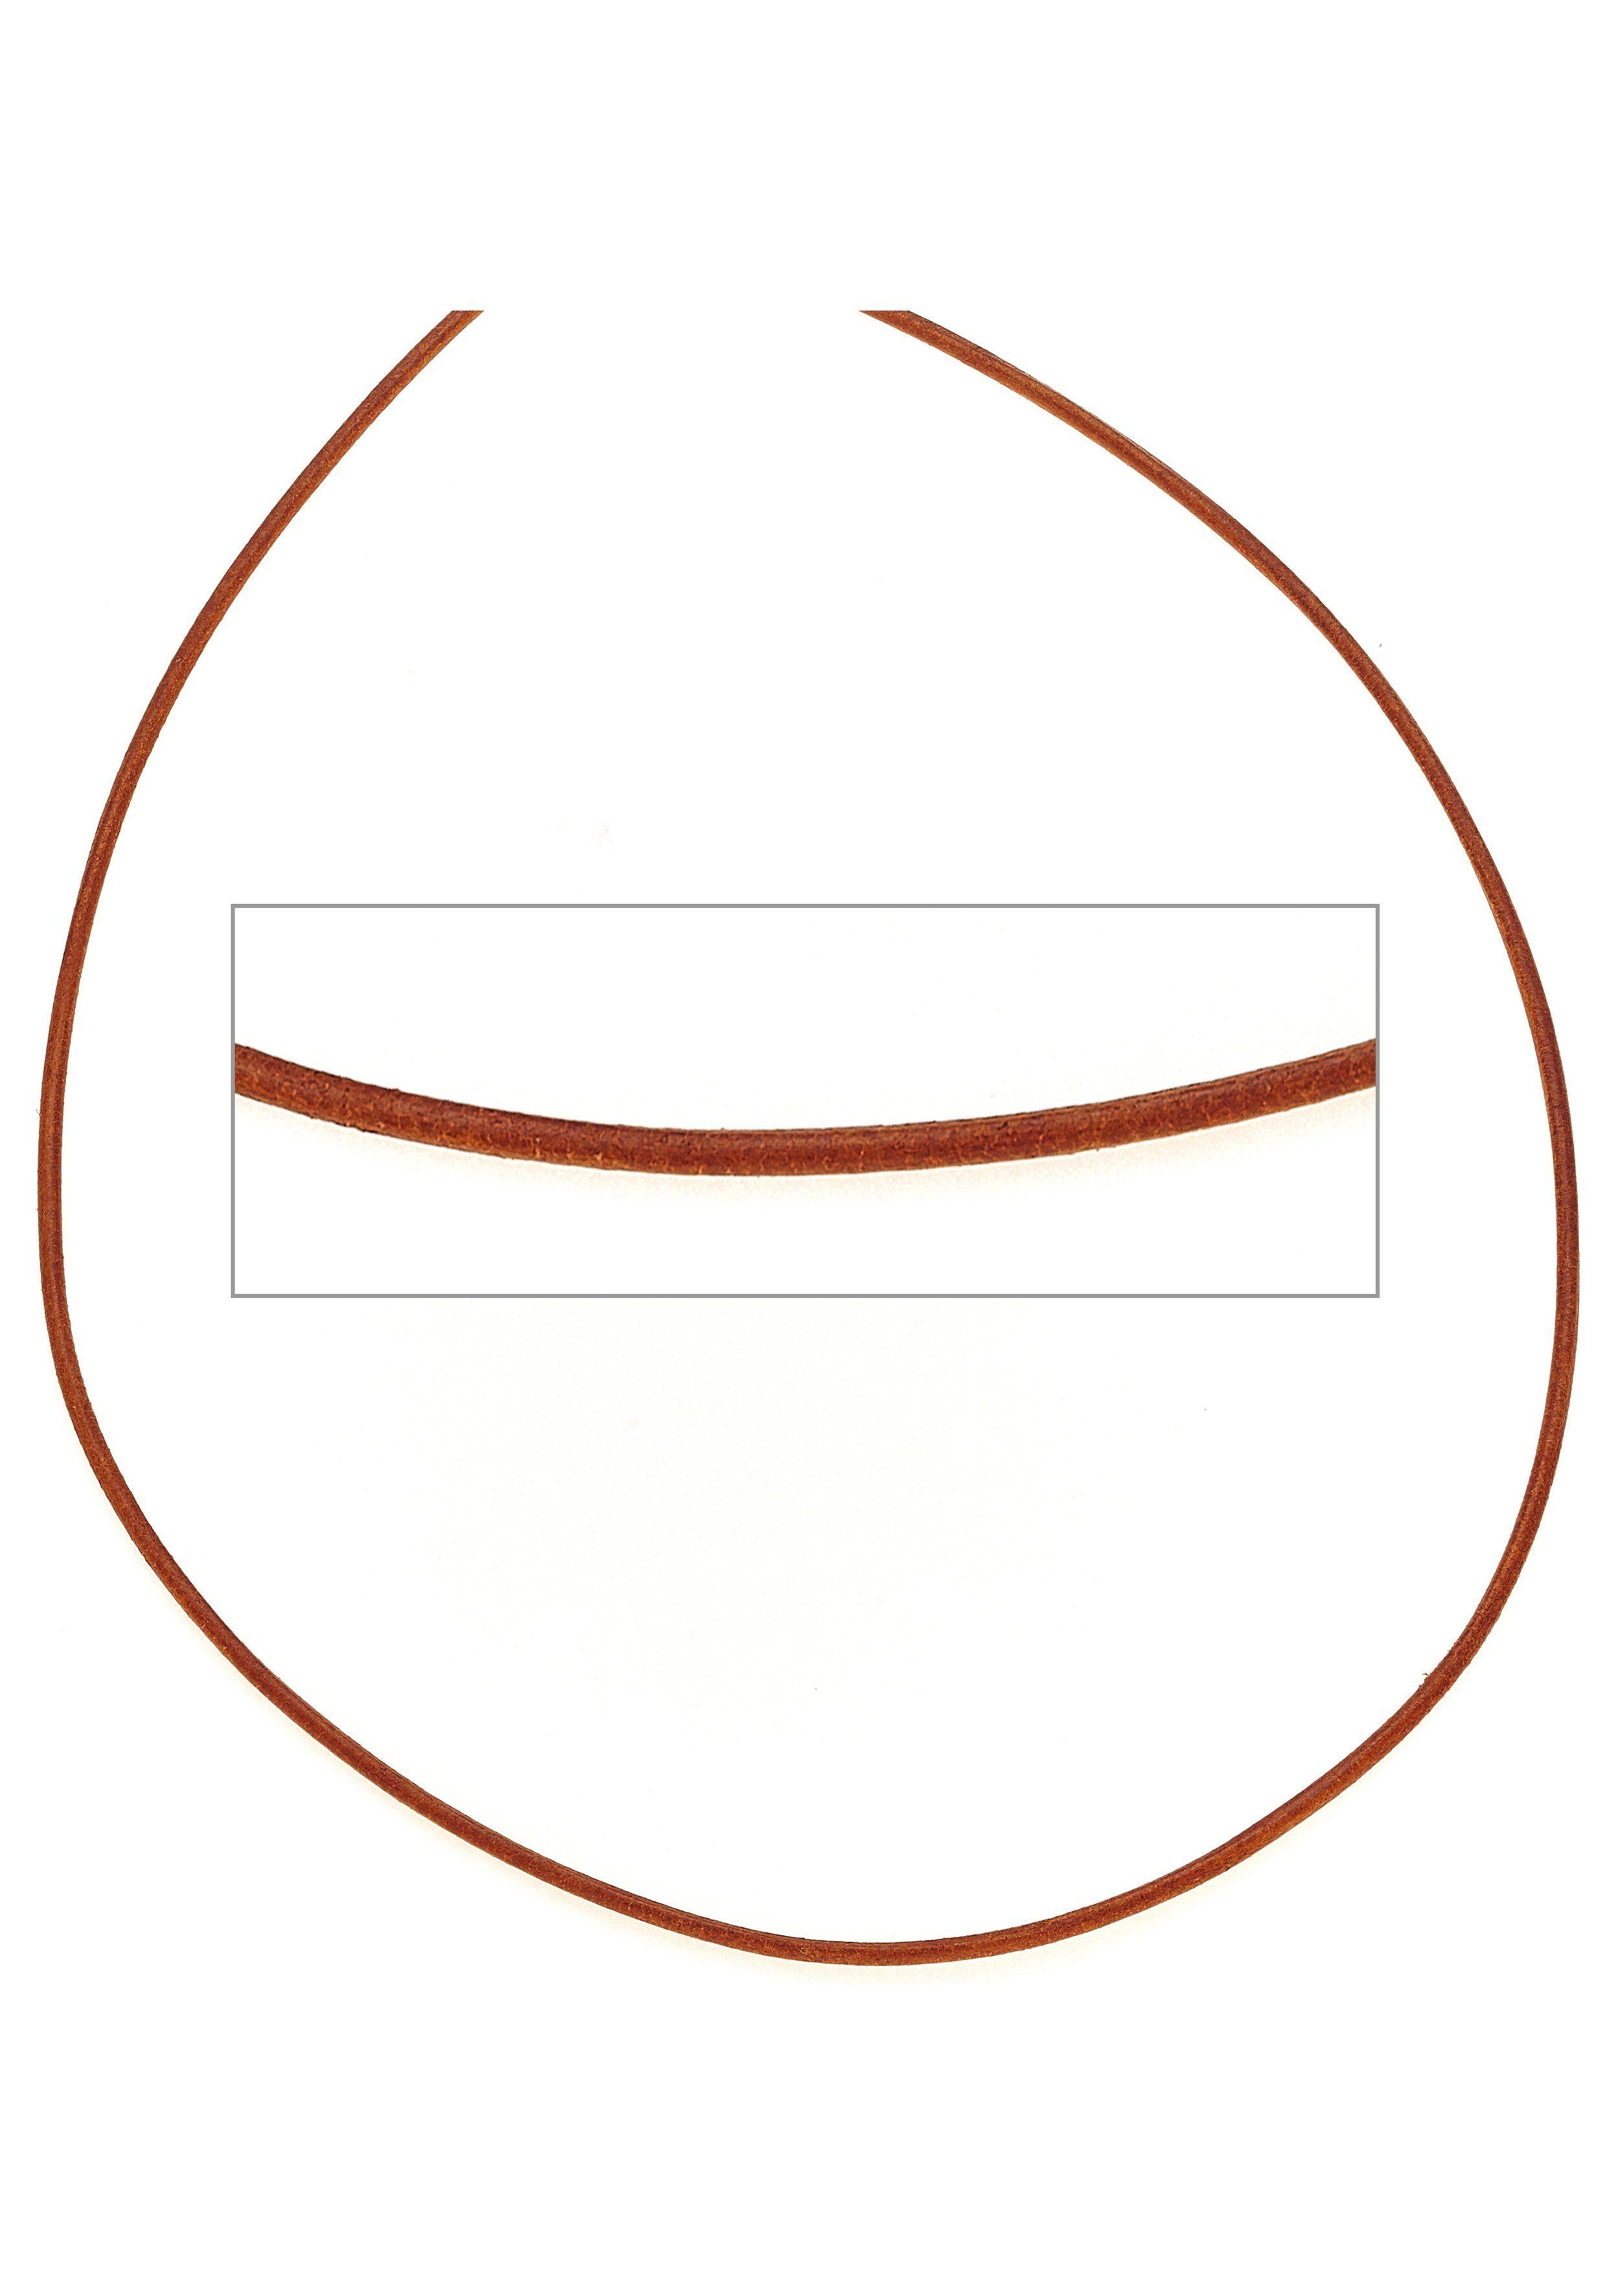 JOBO Kette ohne Anhänger Leder orange